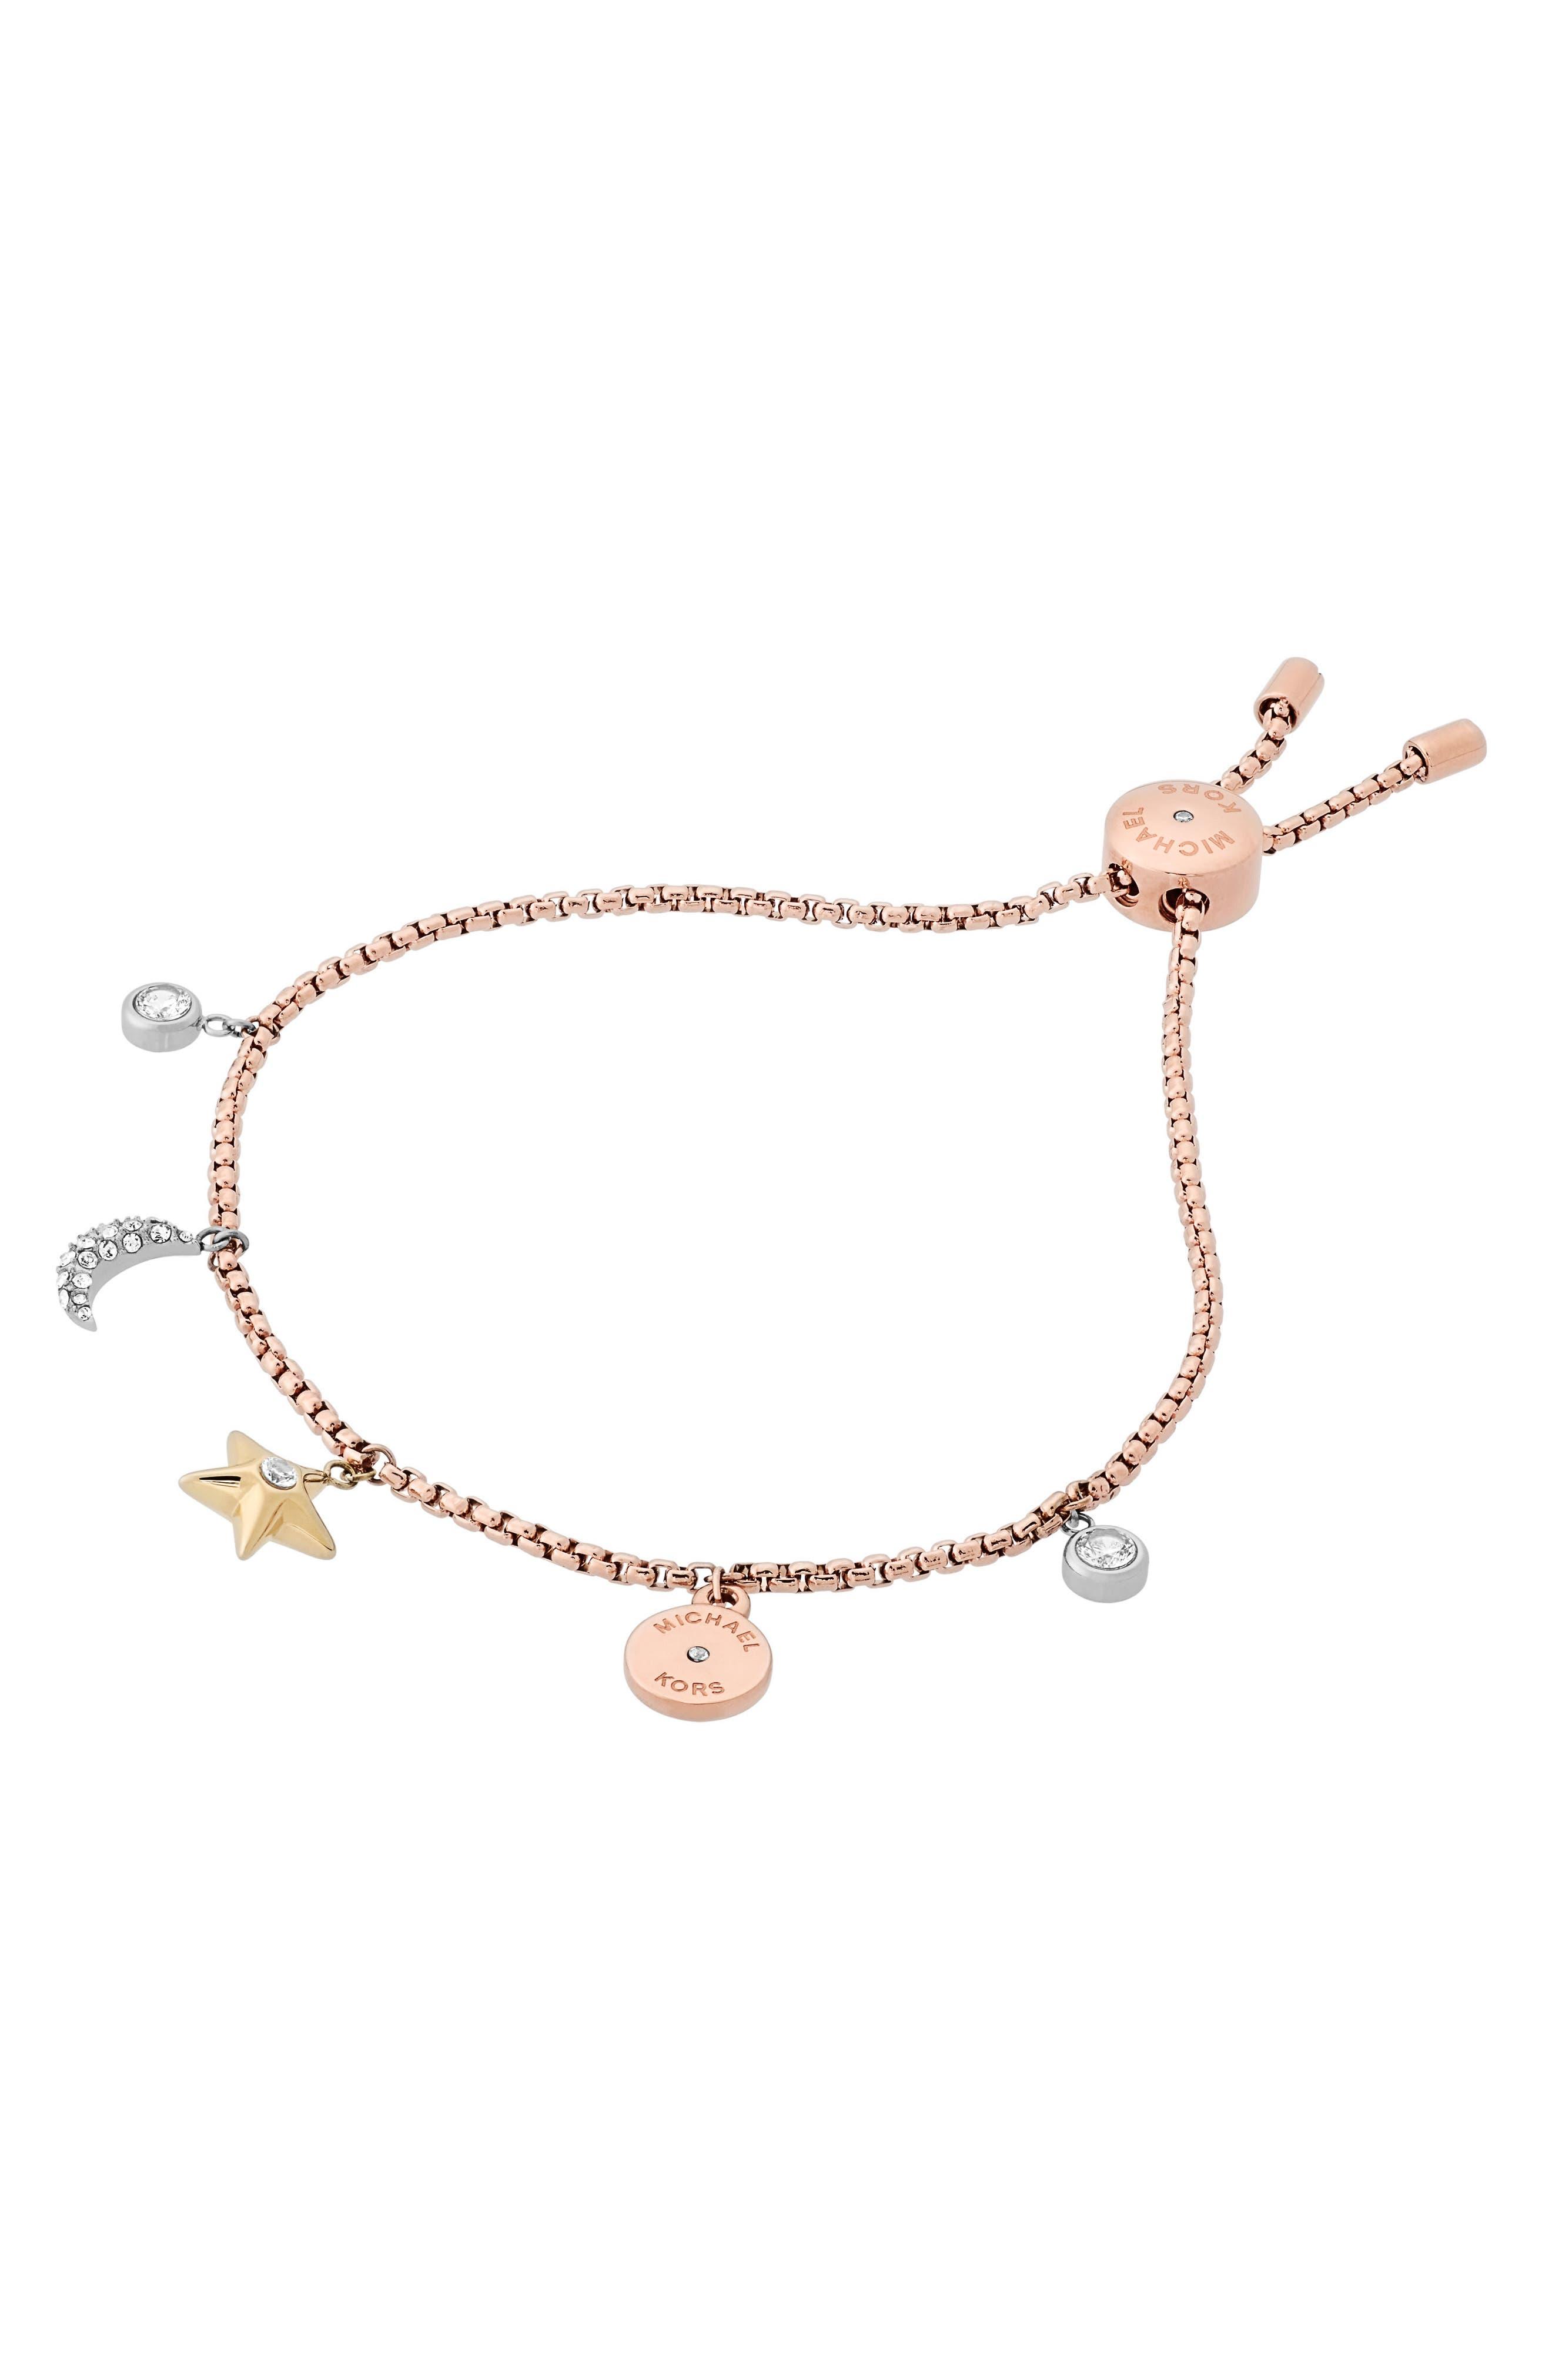 Main Image - Michael Kors Adjustable Slide Bracelet